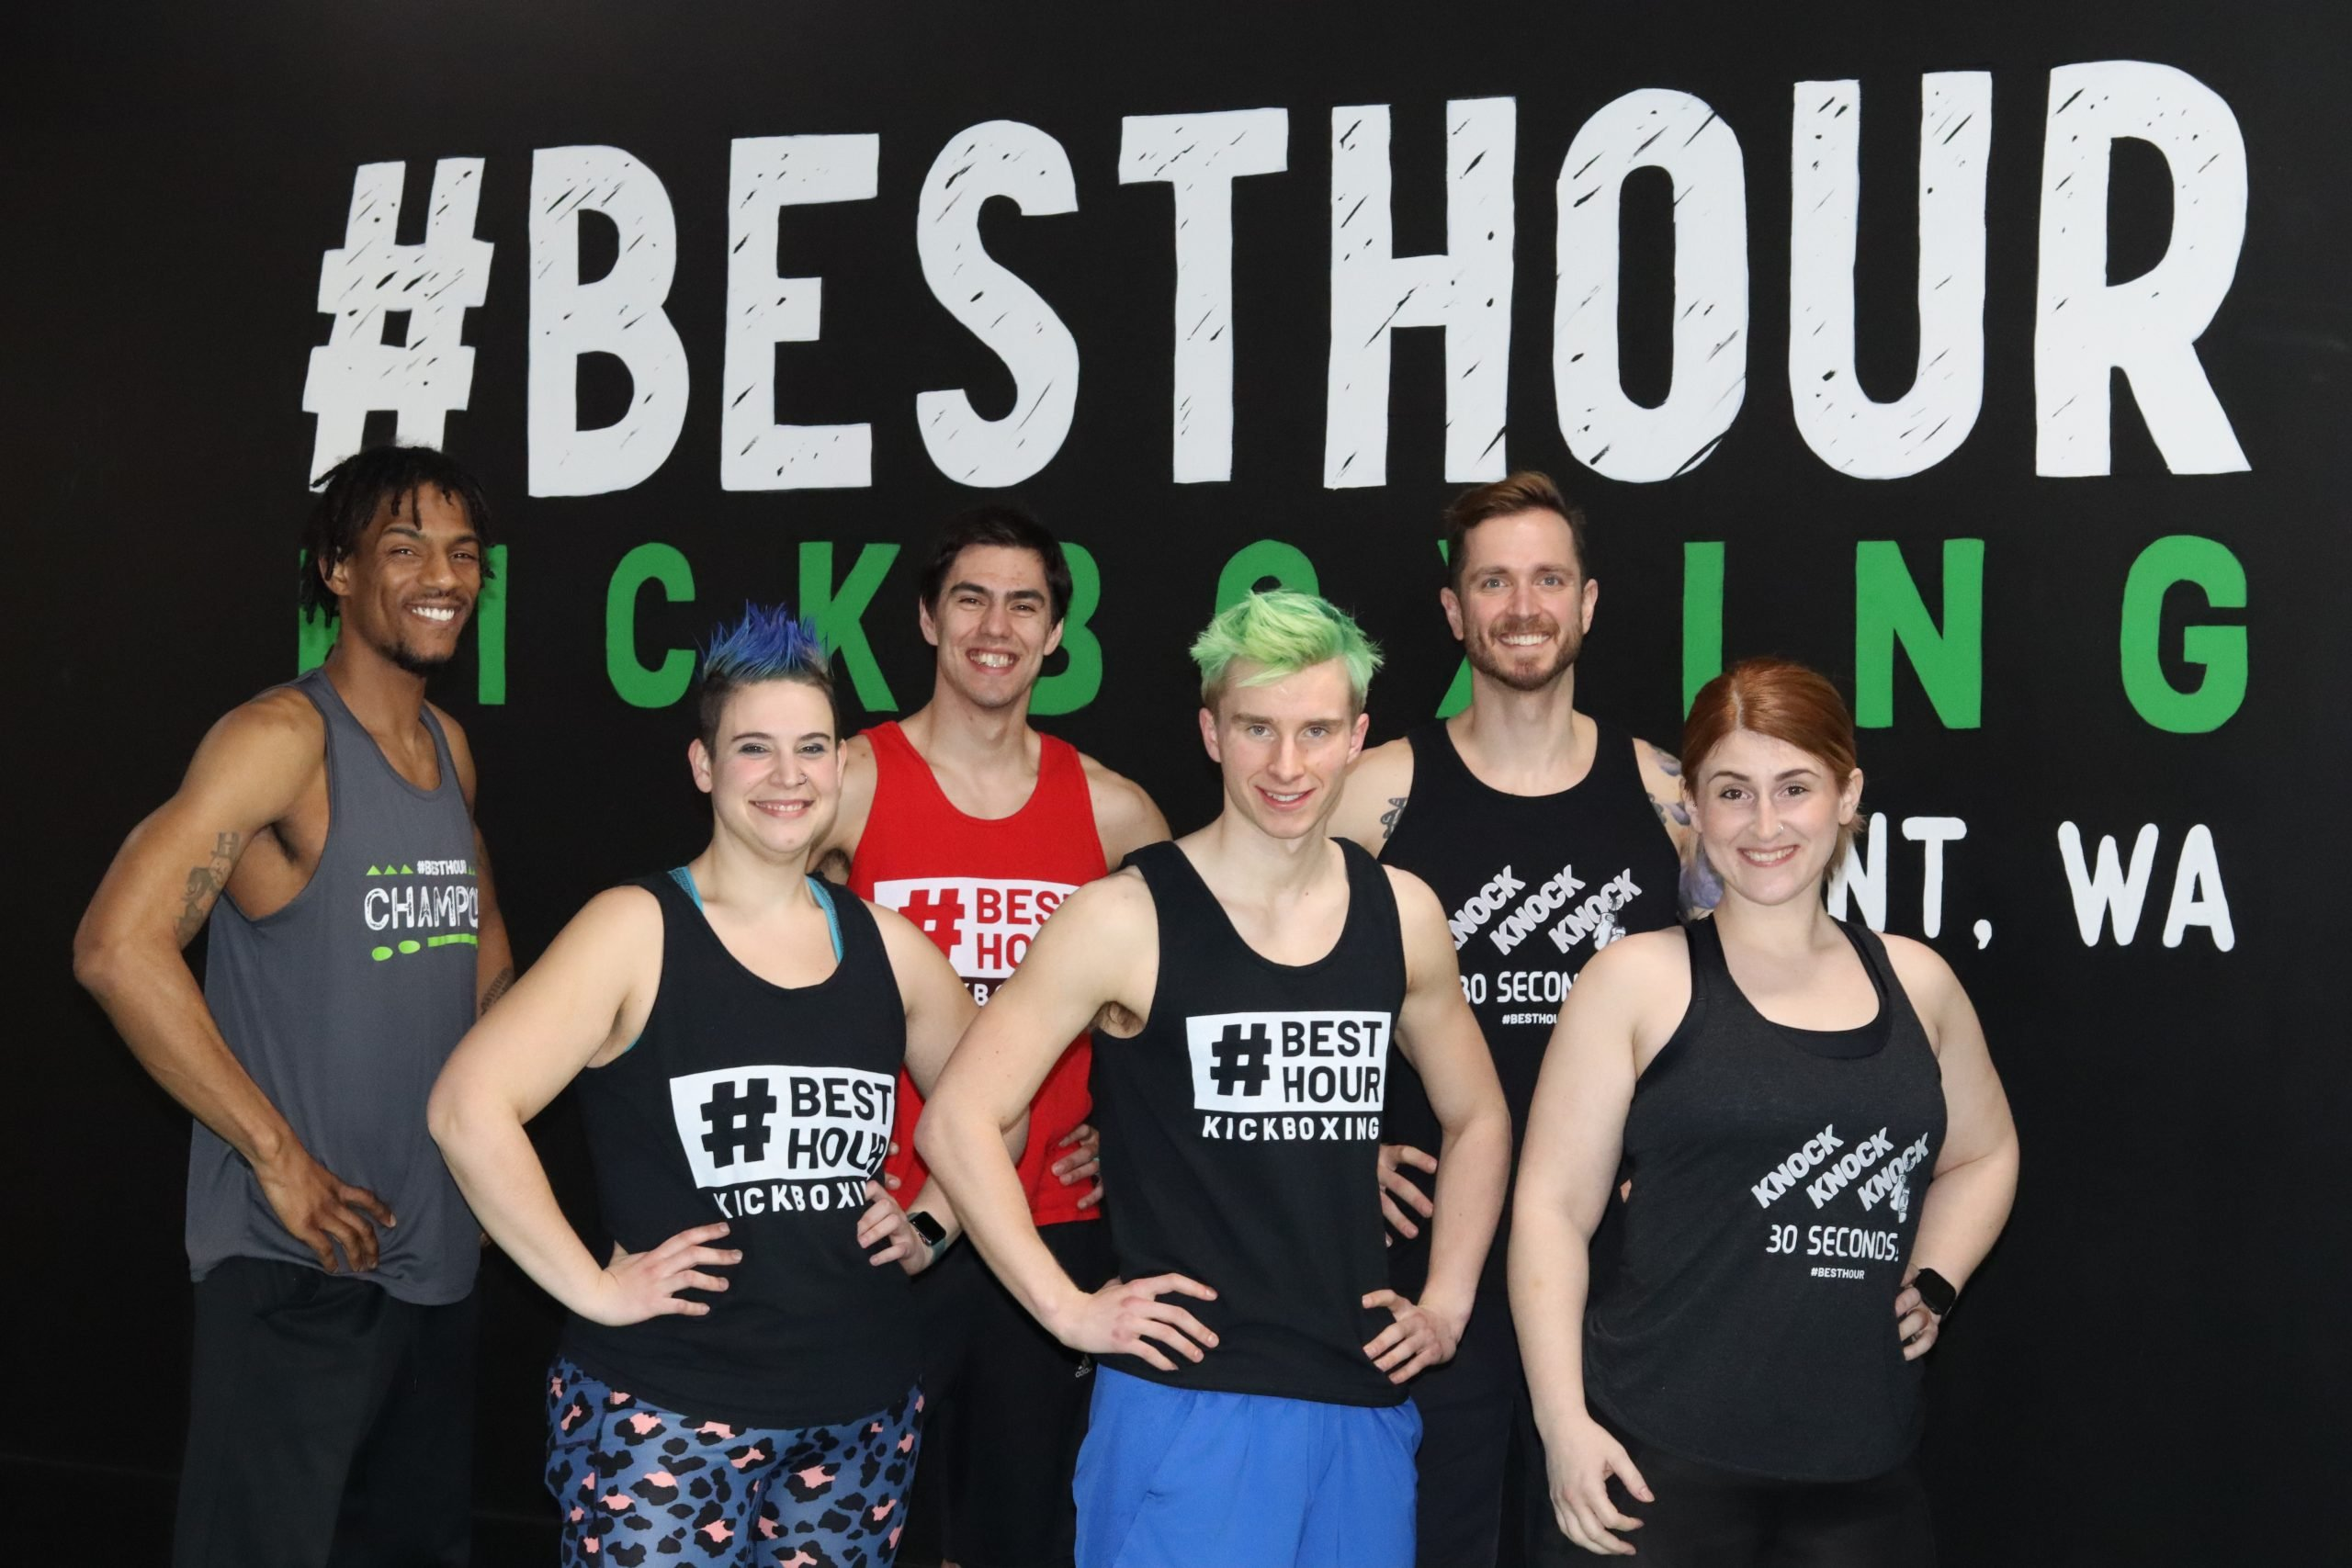 BestHour Kickboxing Instructor Team